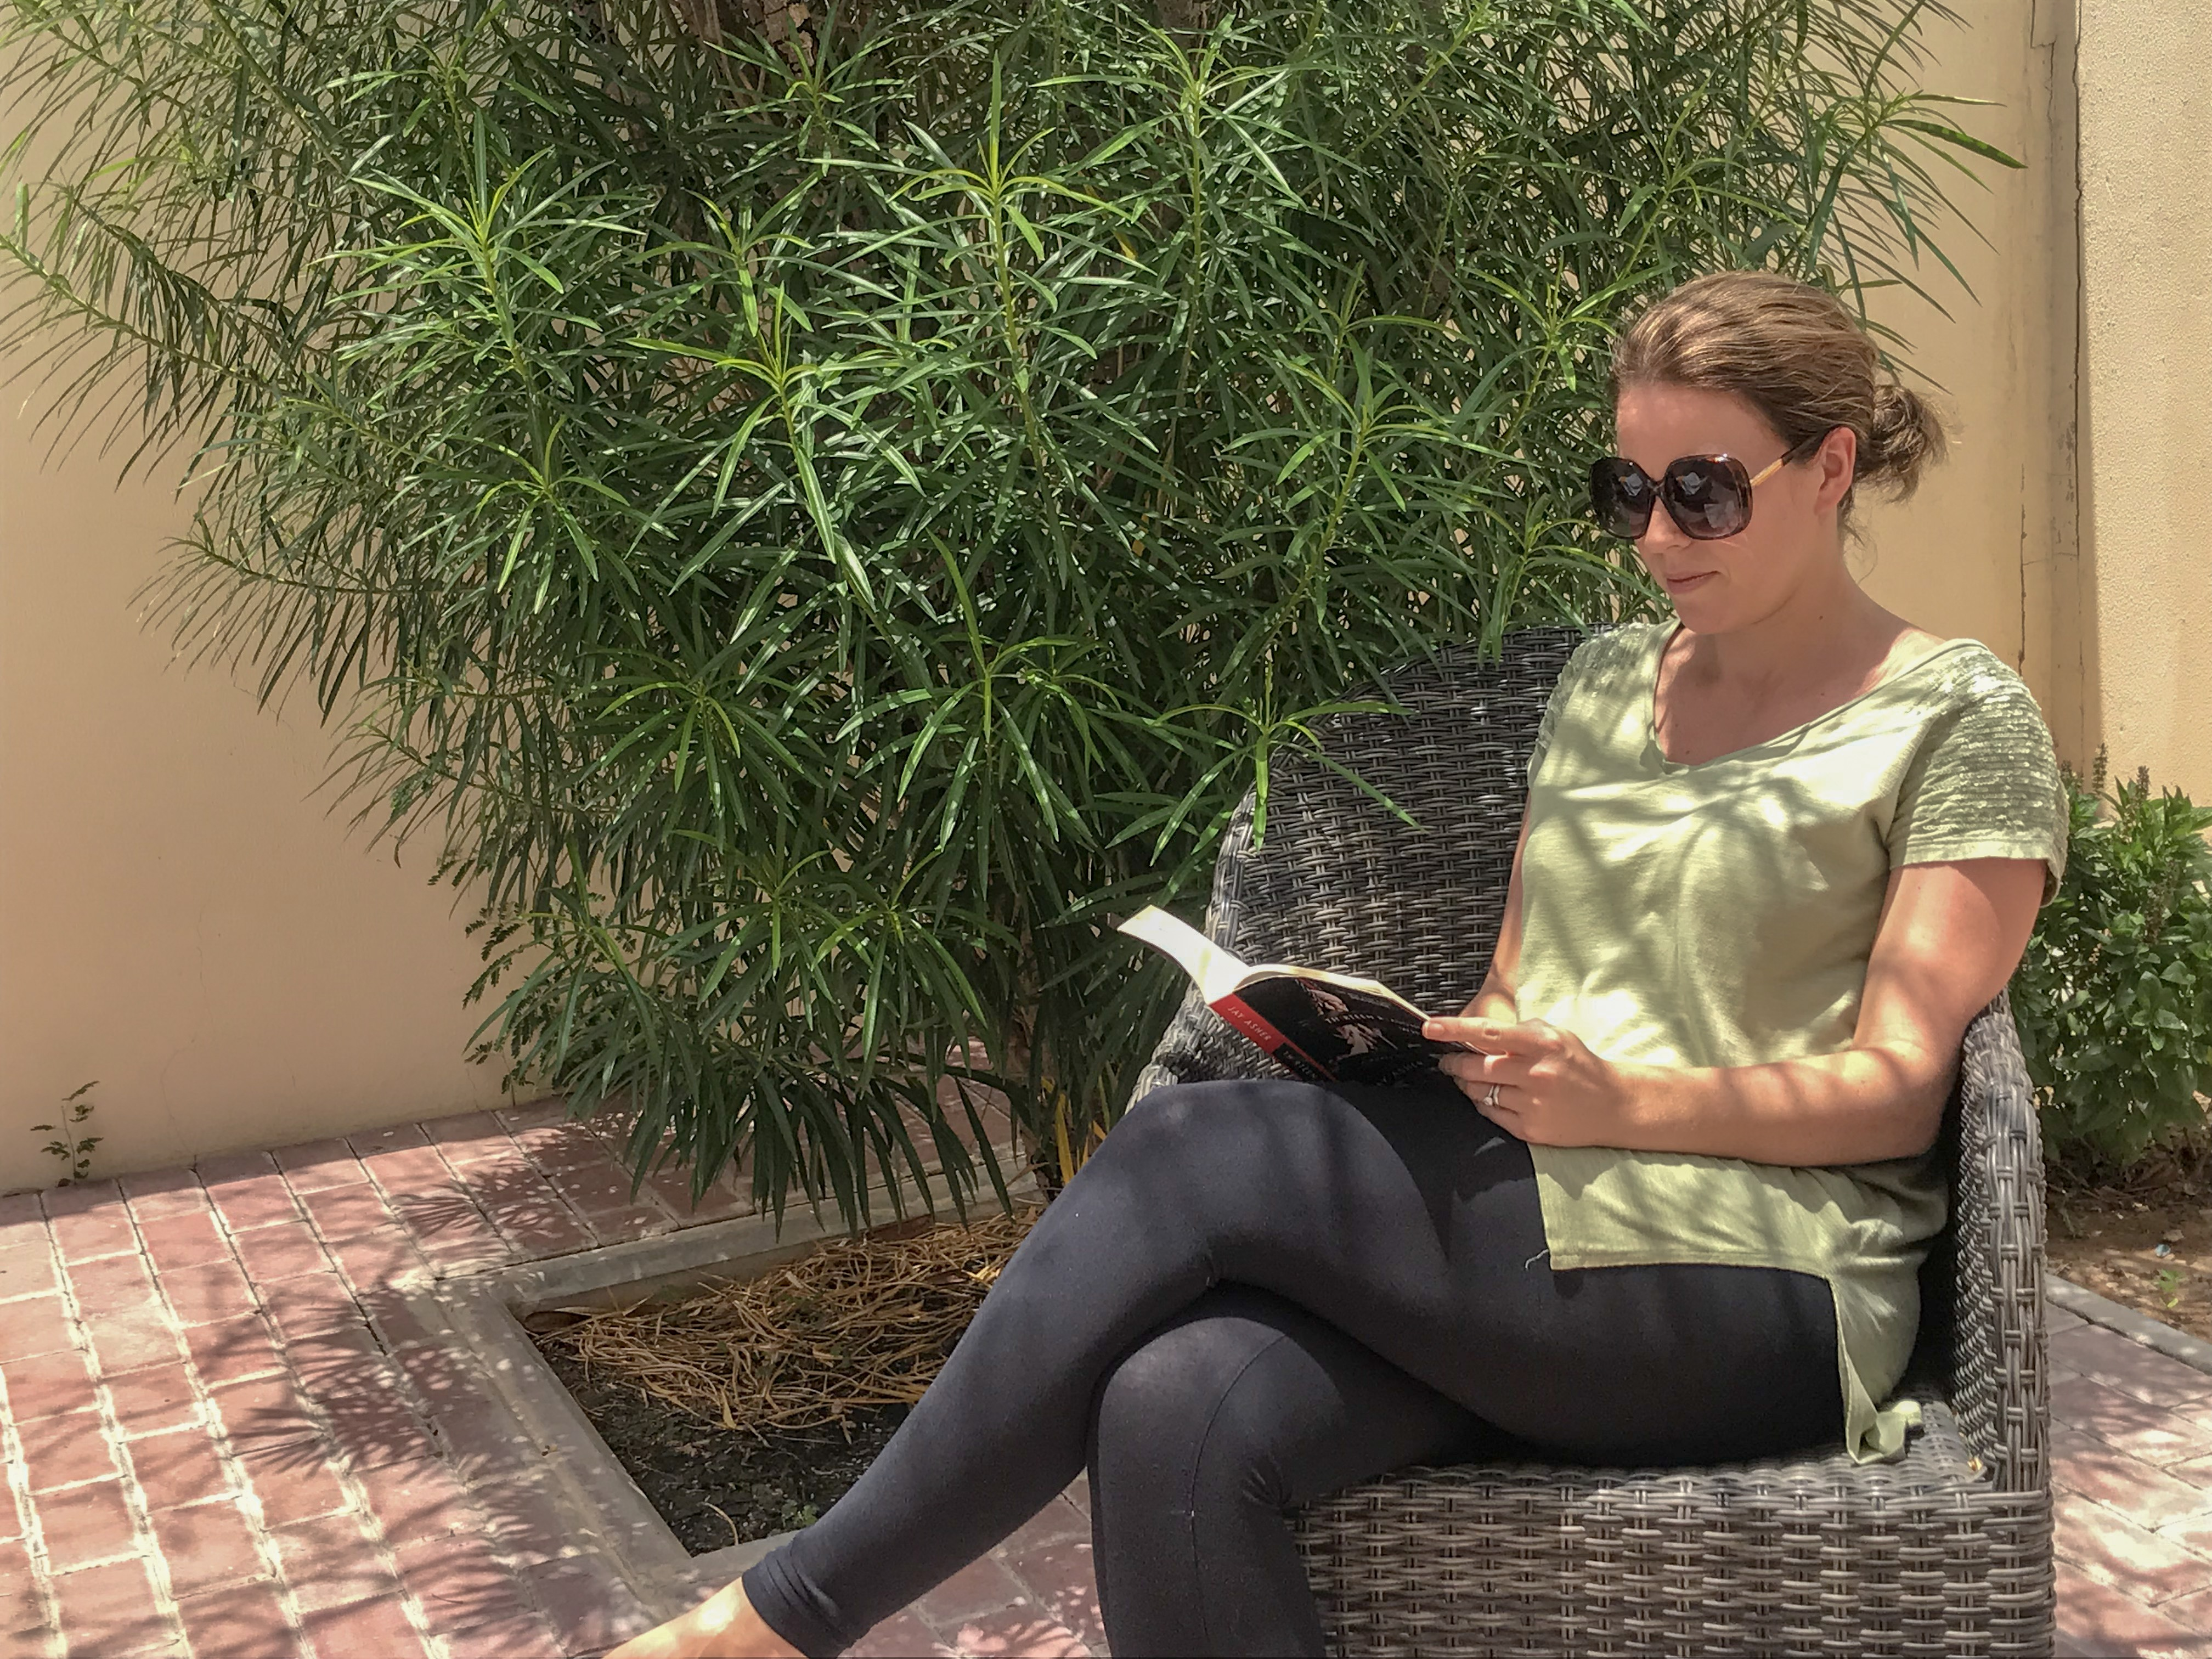 summer reading - my sat in the sun reading